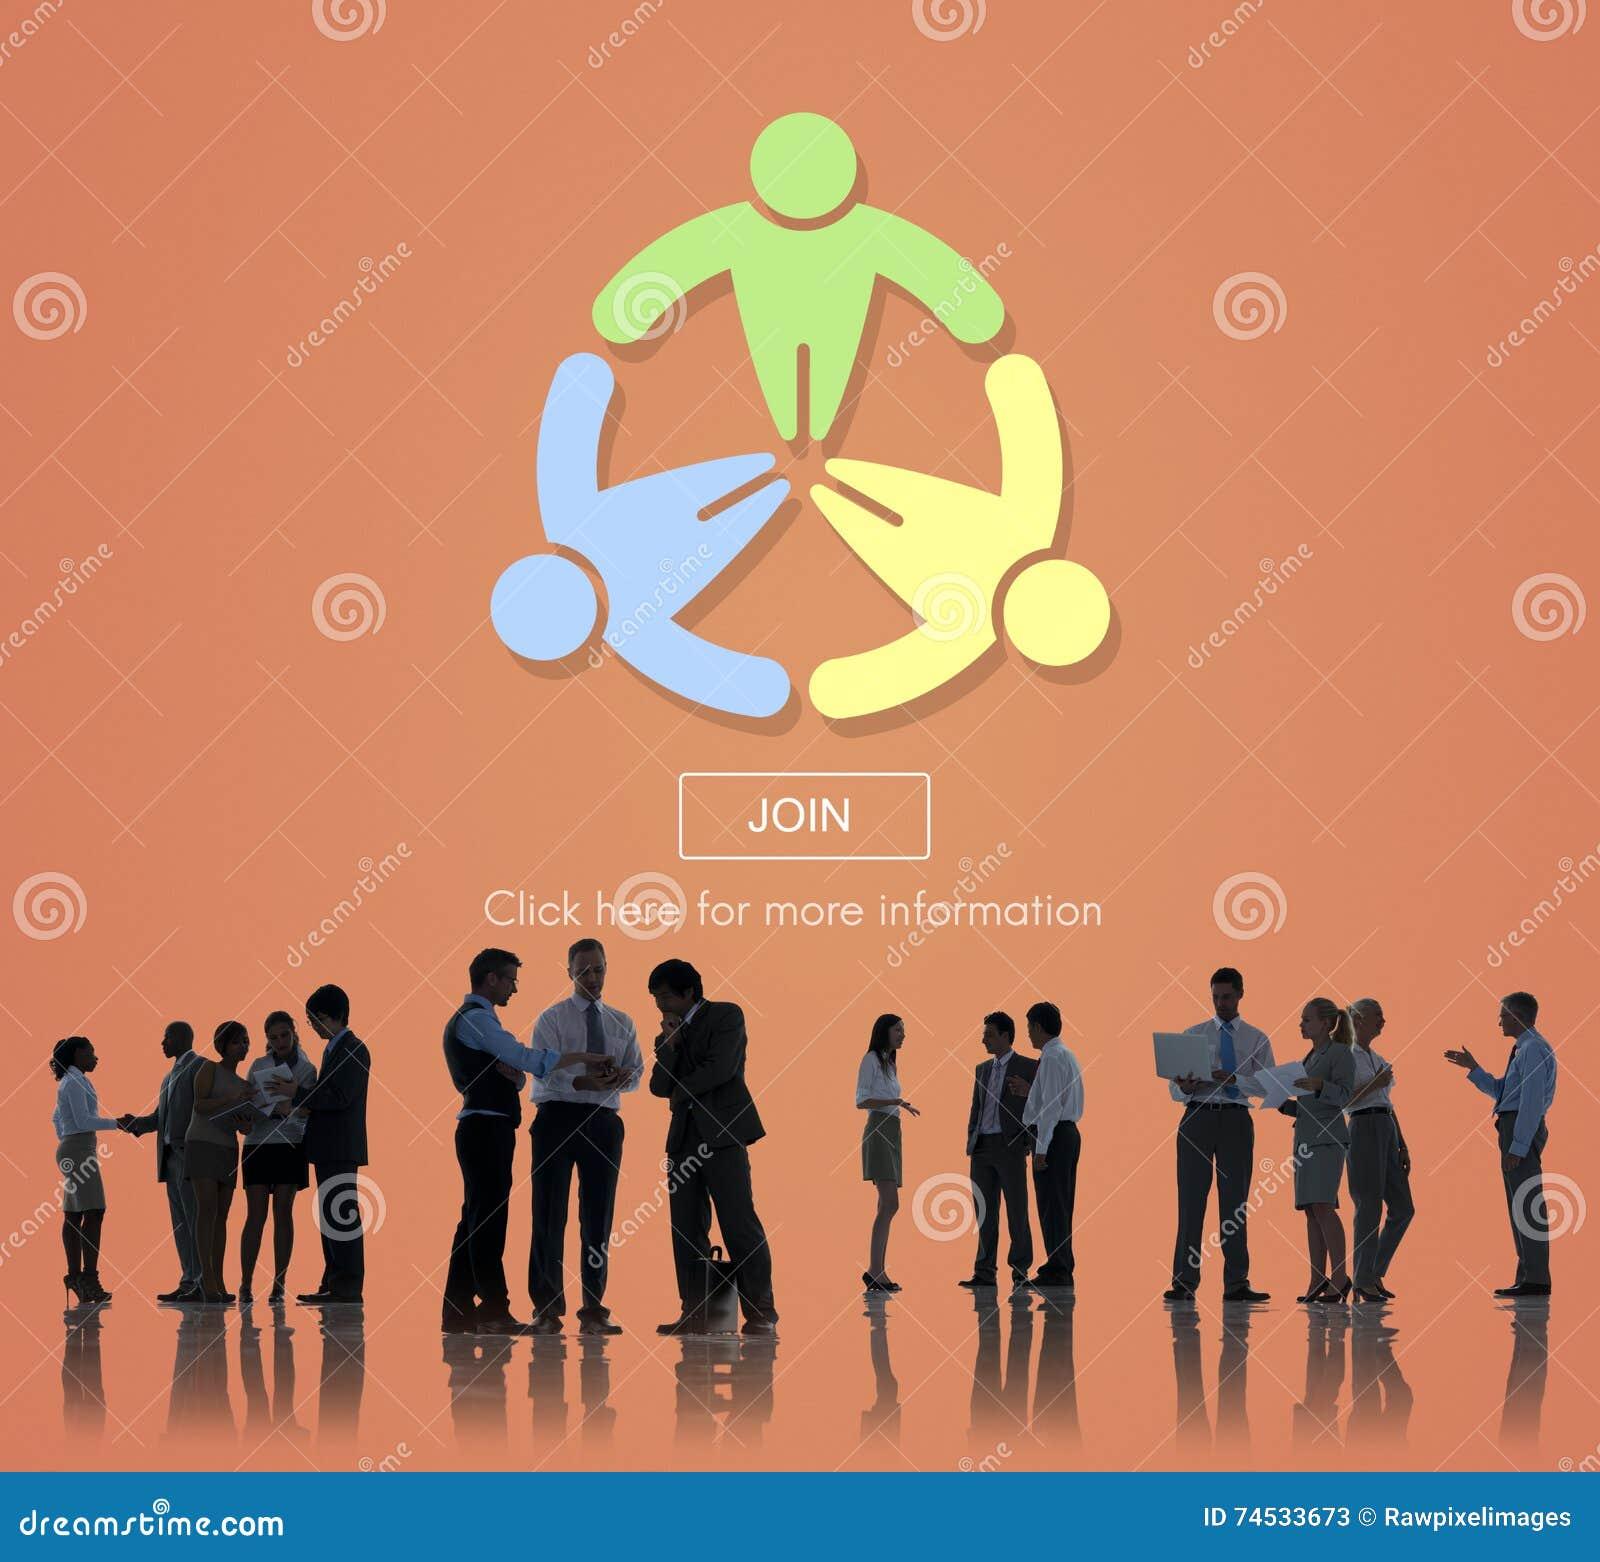 Junte-se aplicam o conceito de junta de aluguer do registro de sociedade